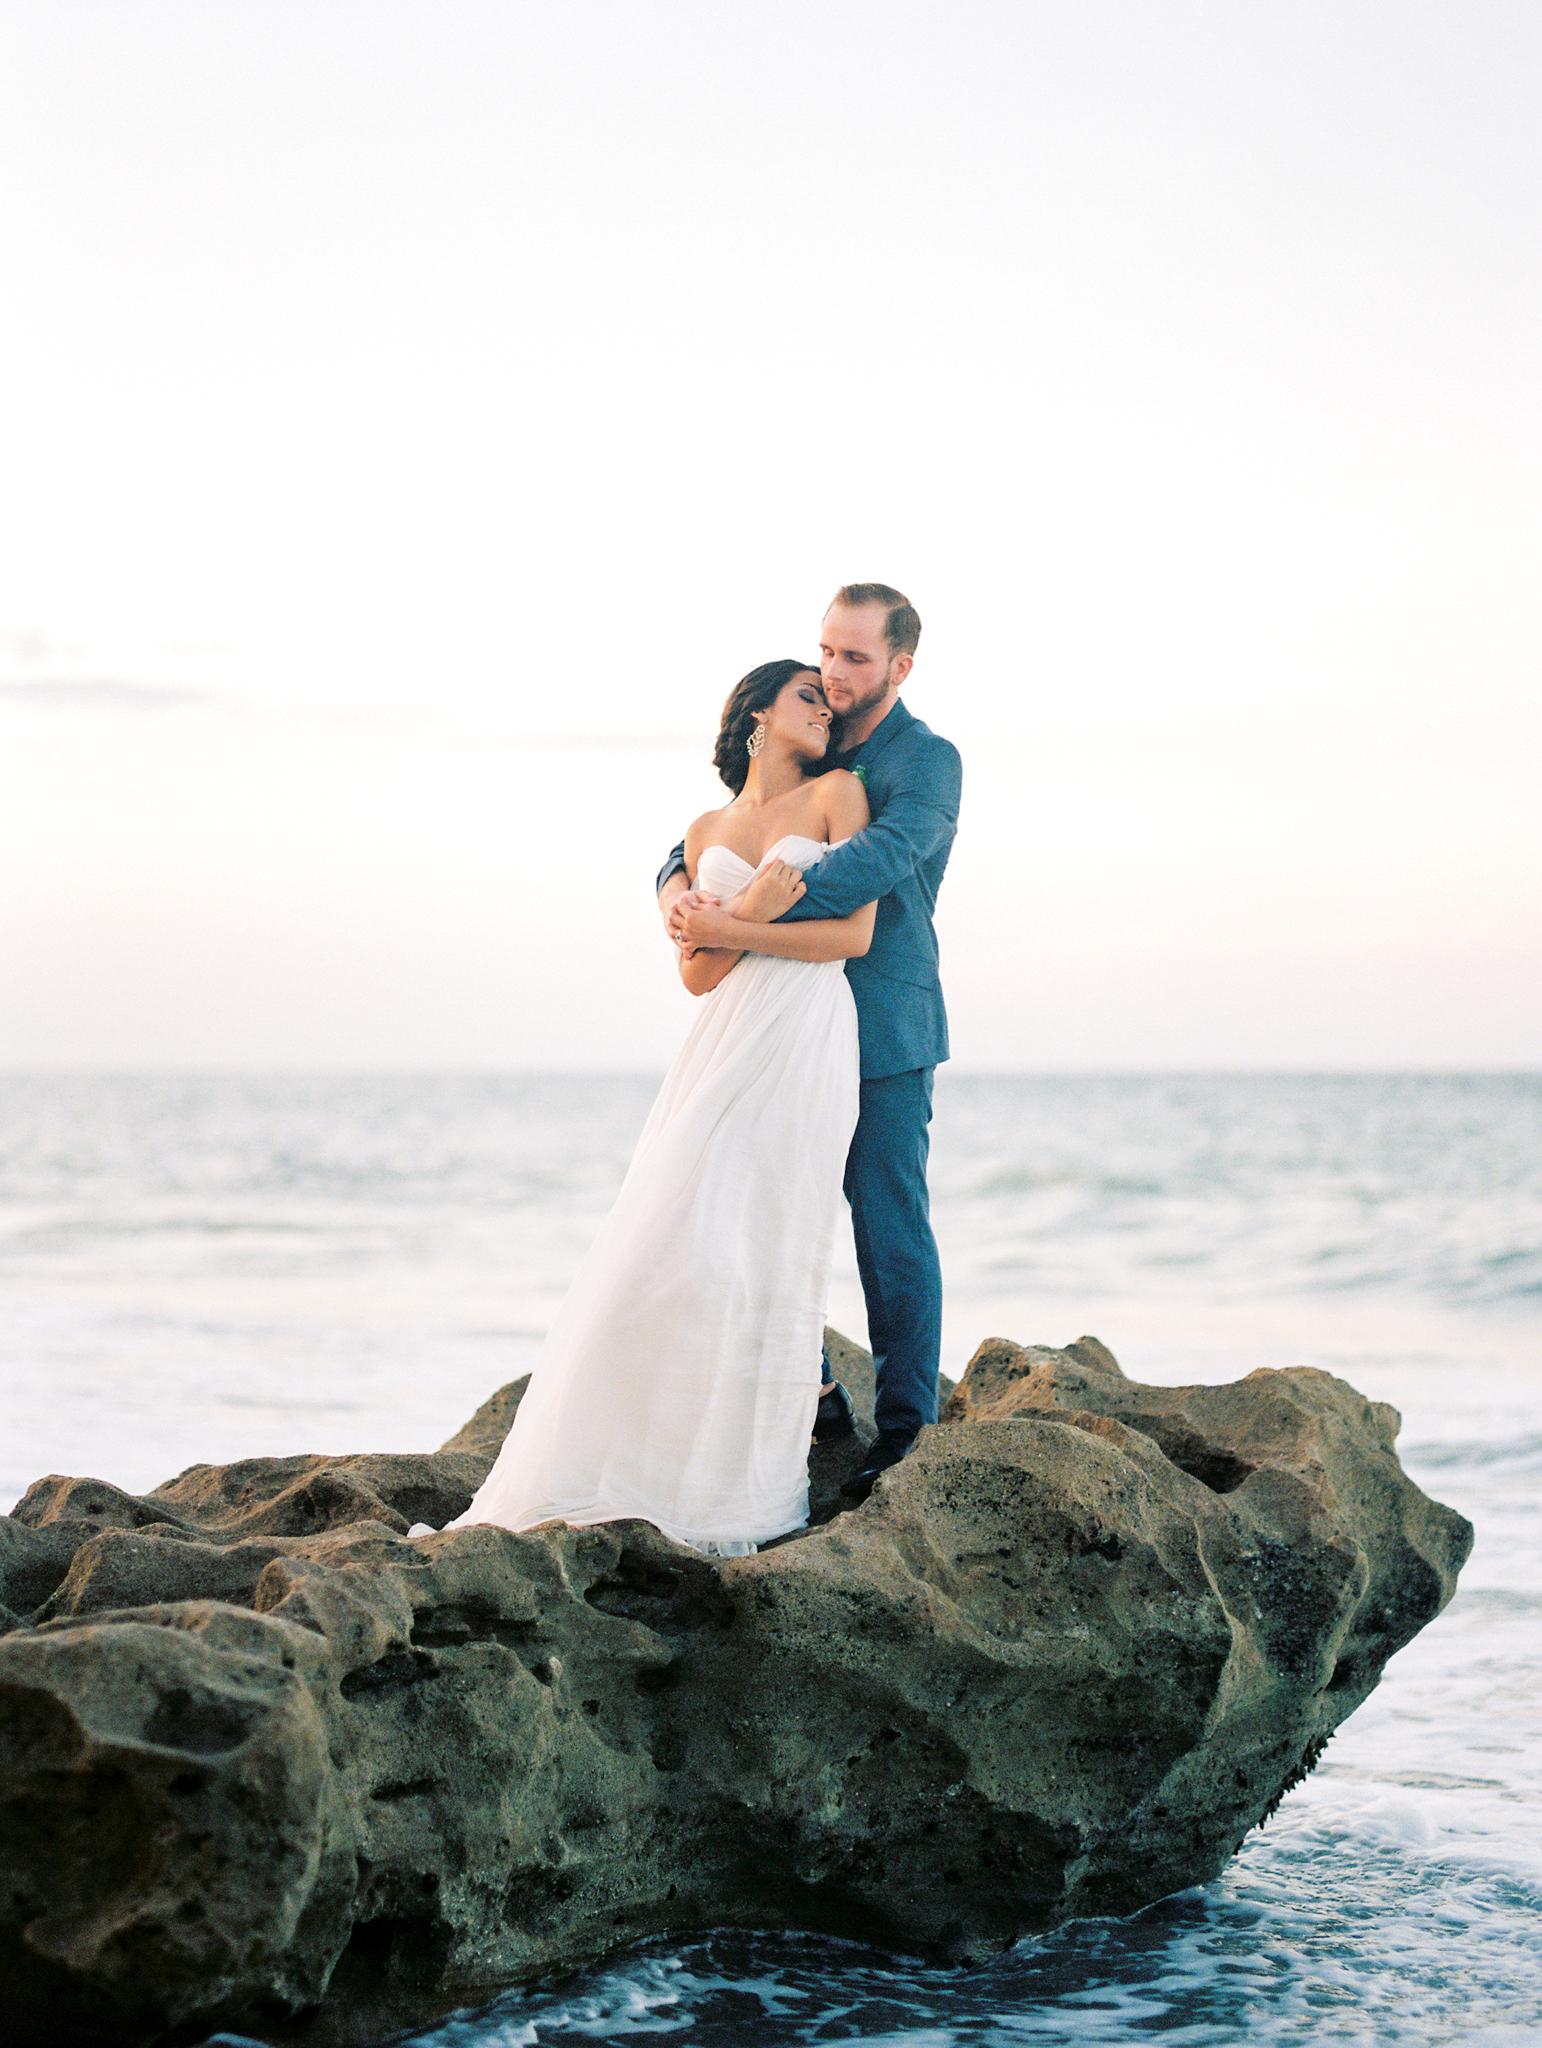 coral cove, jupiter beach FL, palm beach wedding photos, bride and groom